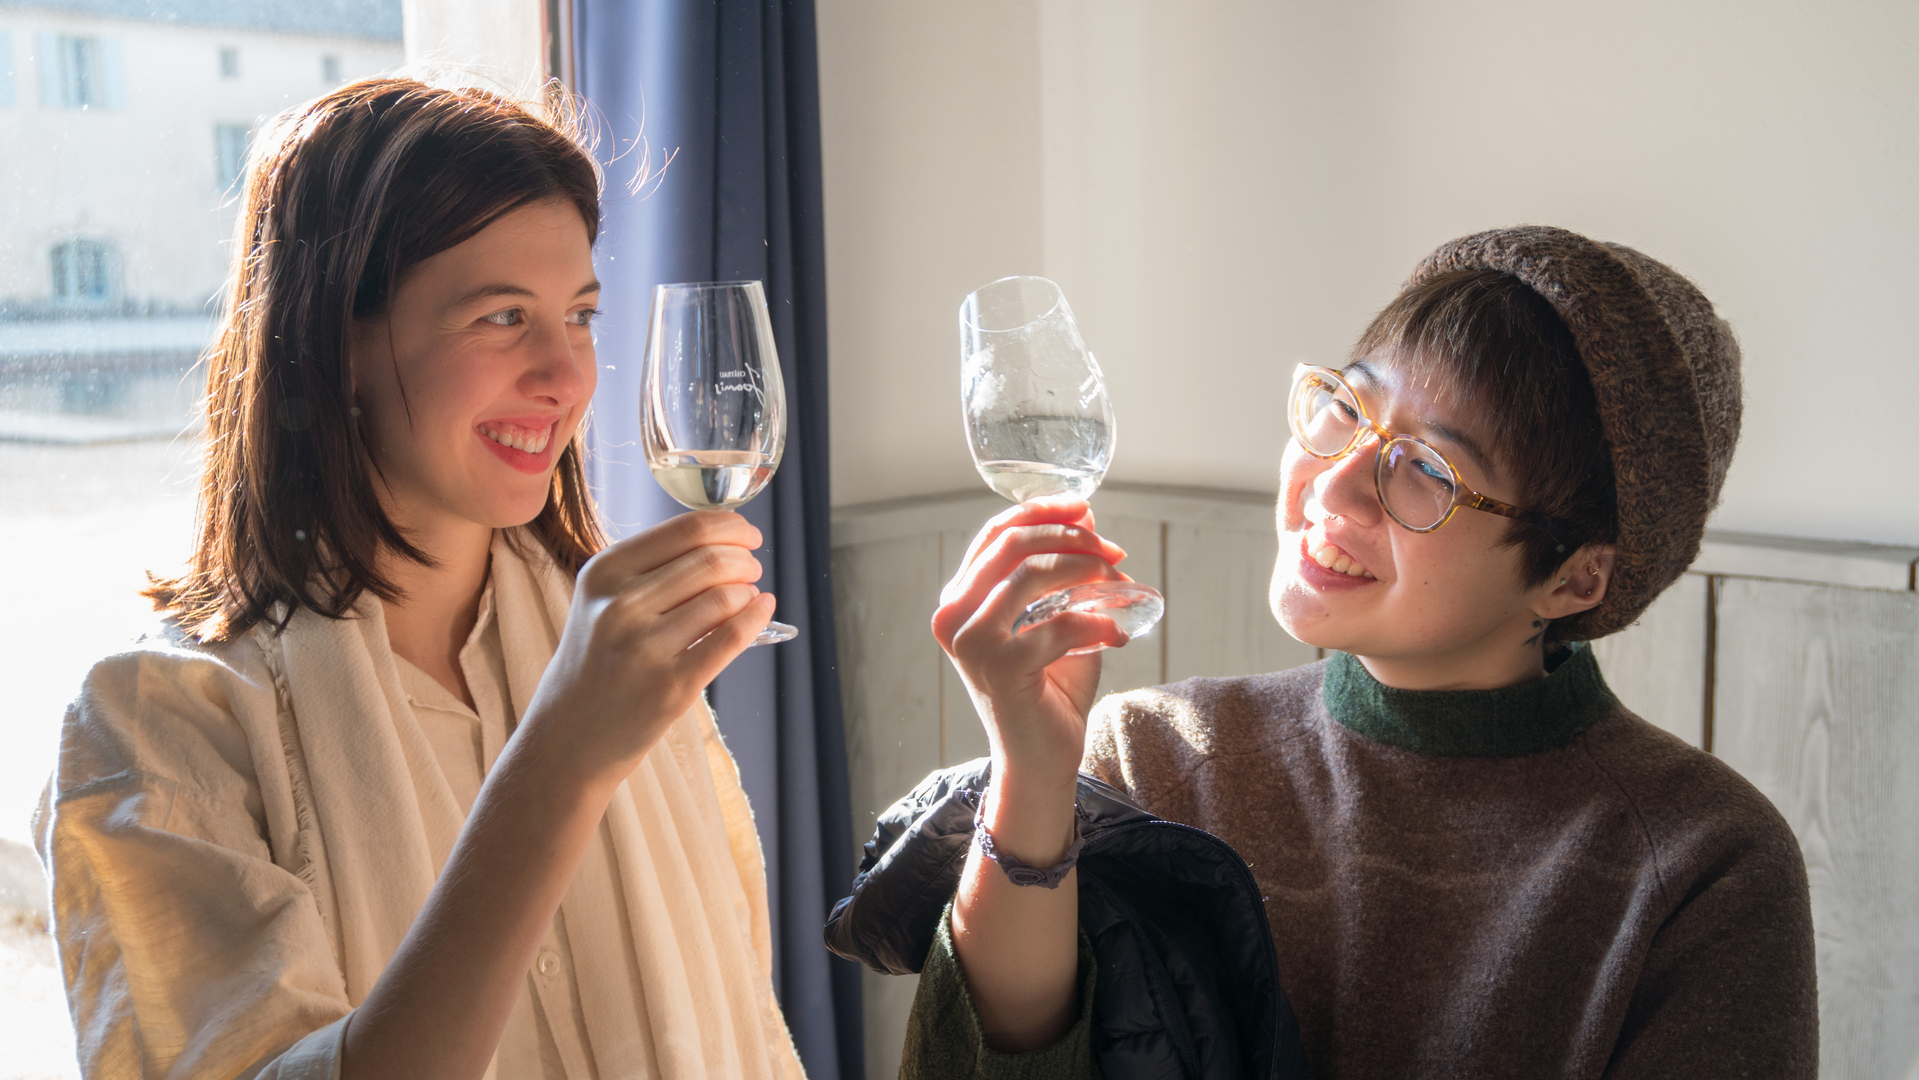 Wine tasting study abroad students Rowan Sinclair-Gregg and Jae-Yoon Shin